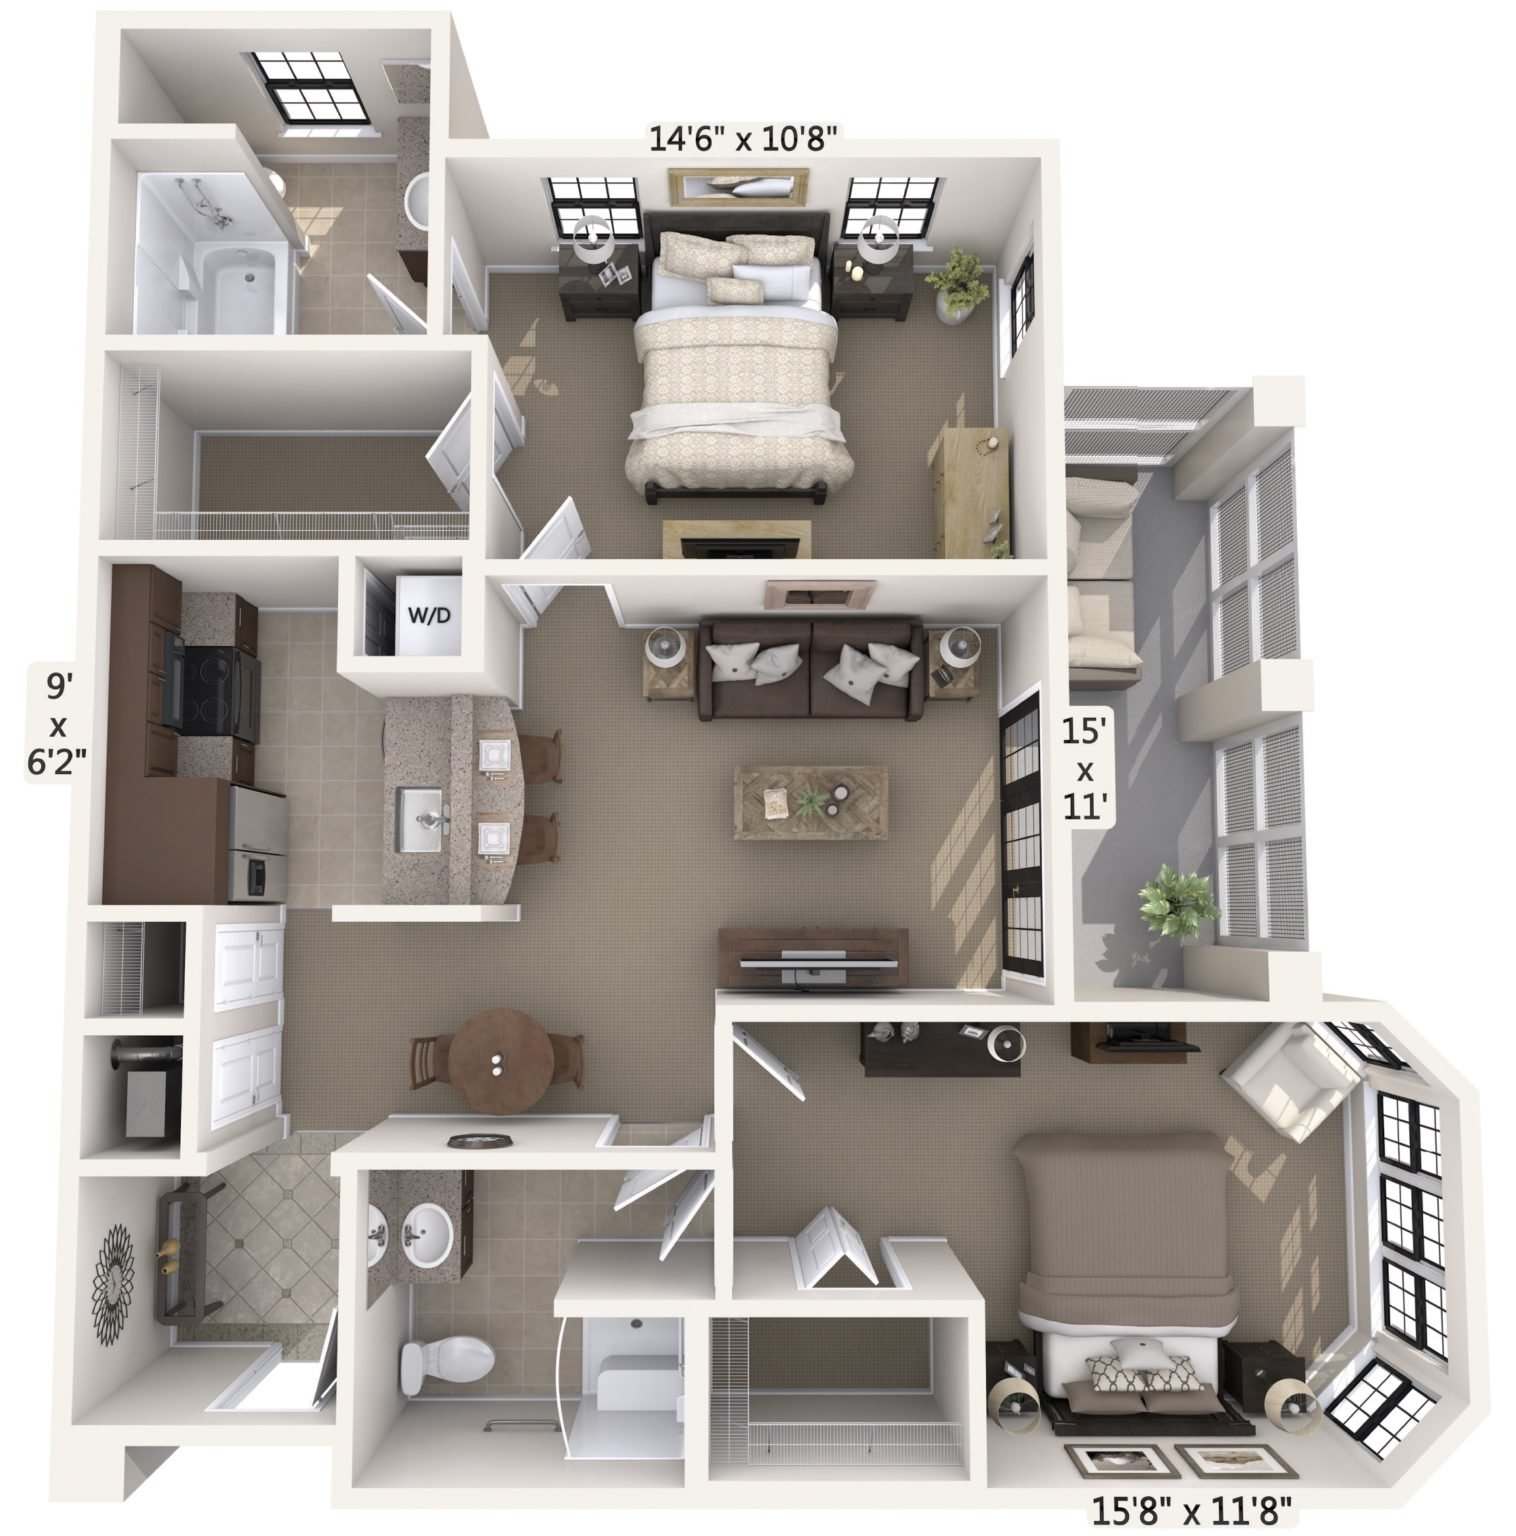 AddingtonPlace_Two-Bedroom-Symphony_1091-sq.-ft._IL_Jupiter-1516x1536